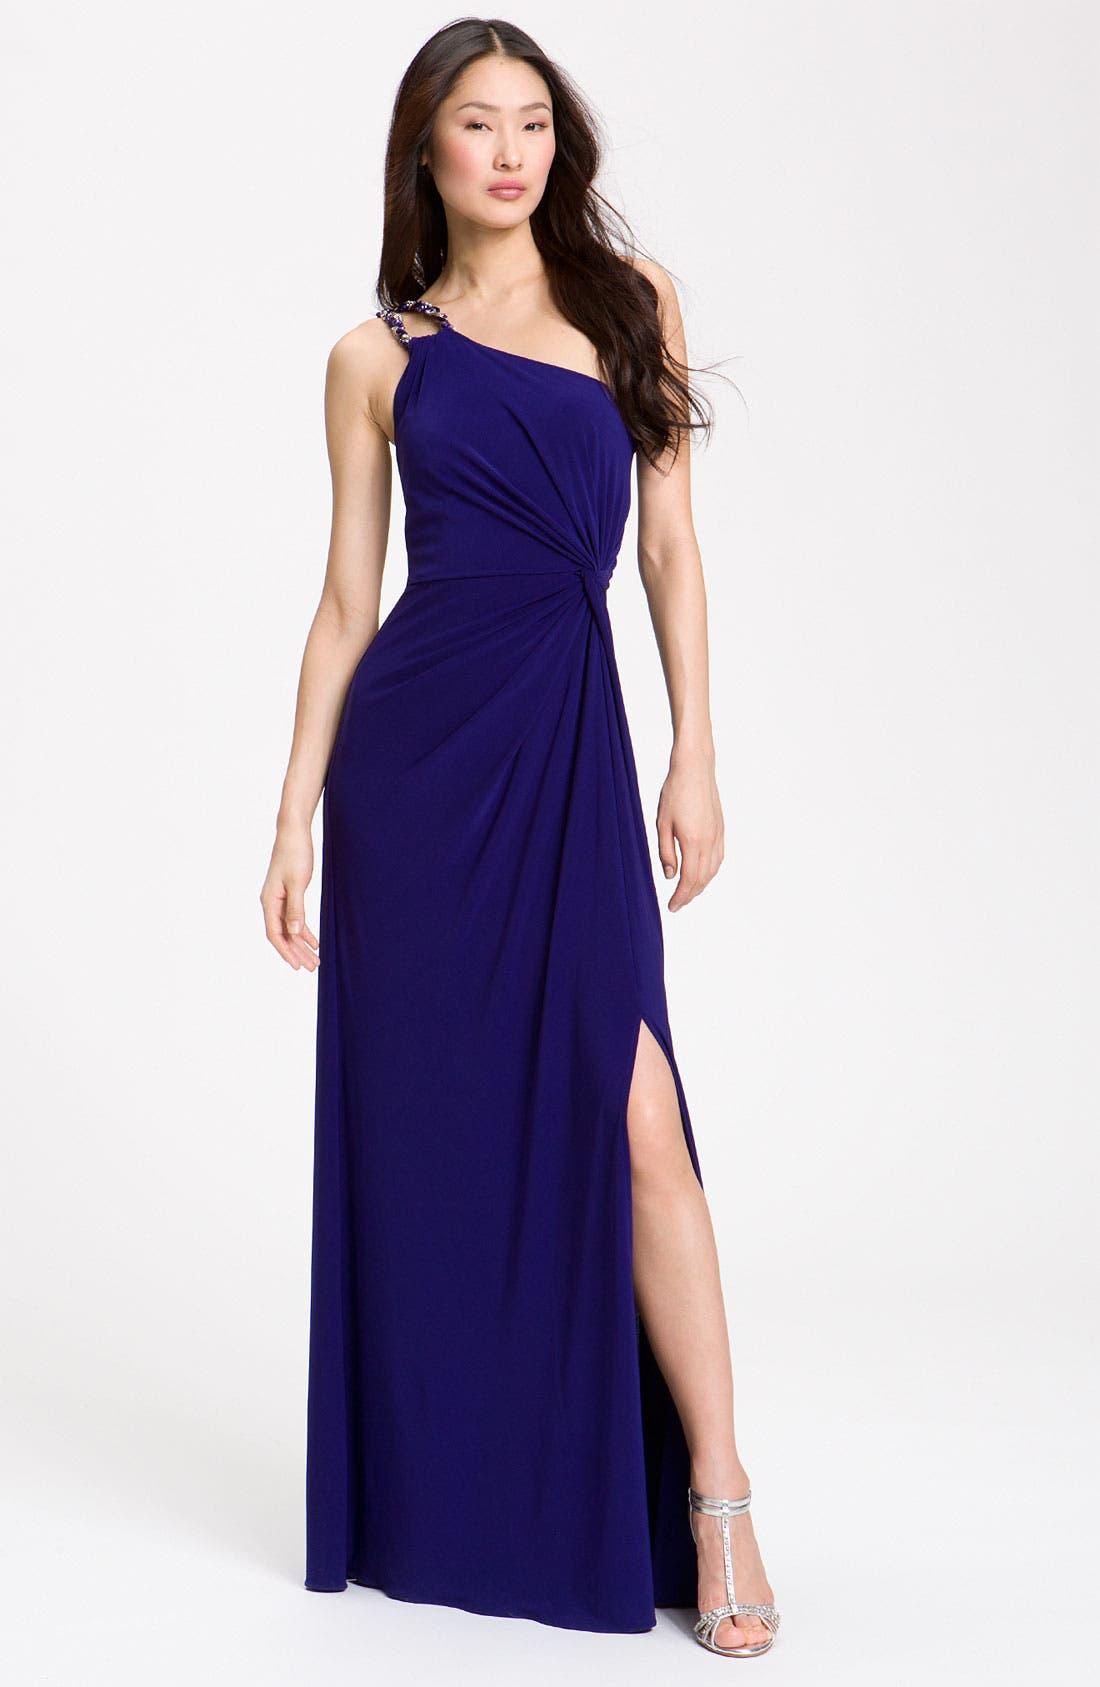 Alternate Image 1 Selected - JS Boutique Knotted One Shoulder Dress (Petite)